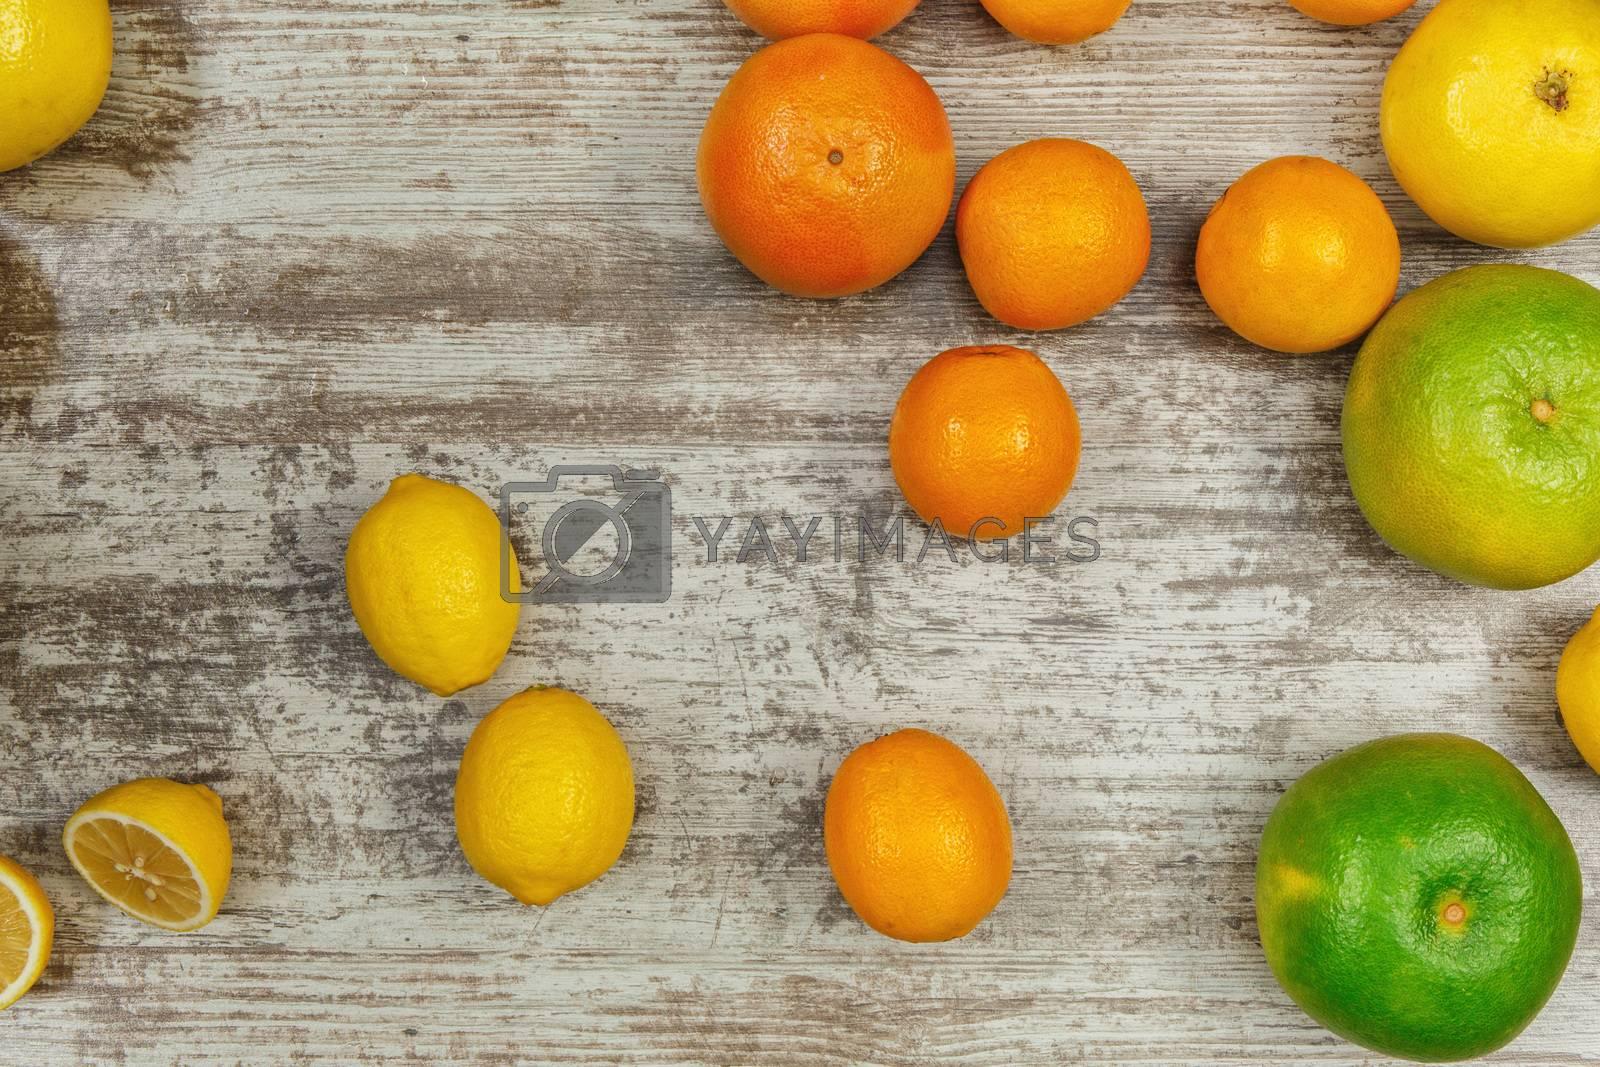 Background from citrus fruits - lemons oranges limes